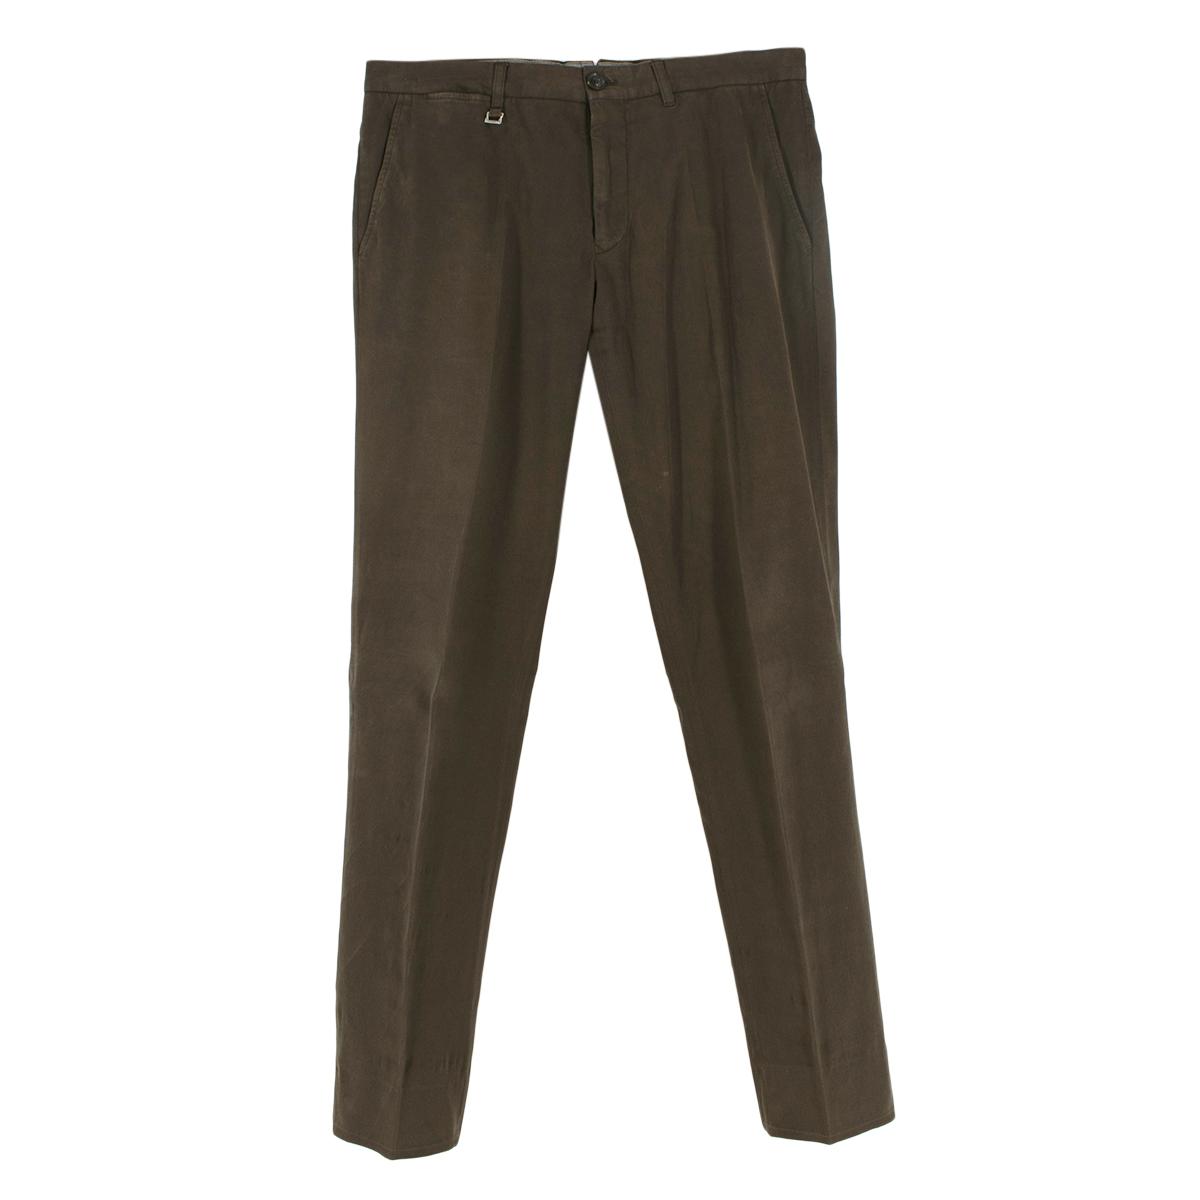 Ermenegildo Zegna Dark Brown Cotton Blend Trousers